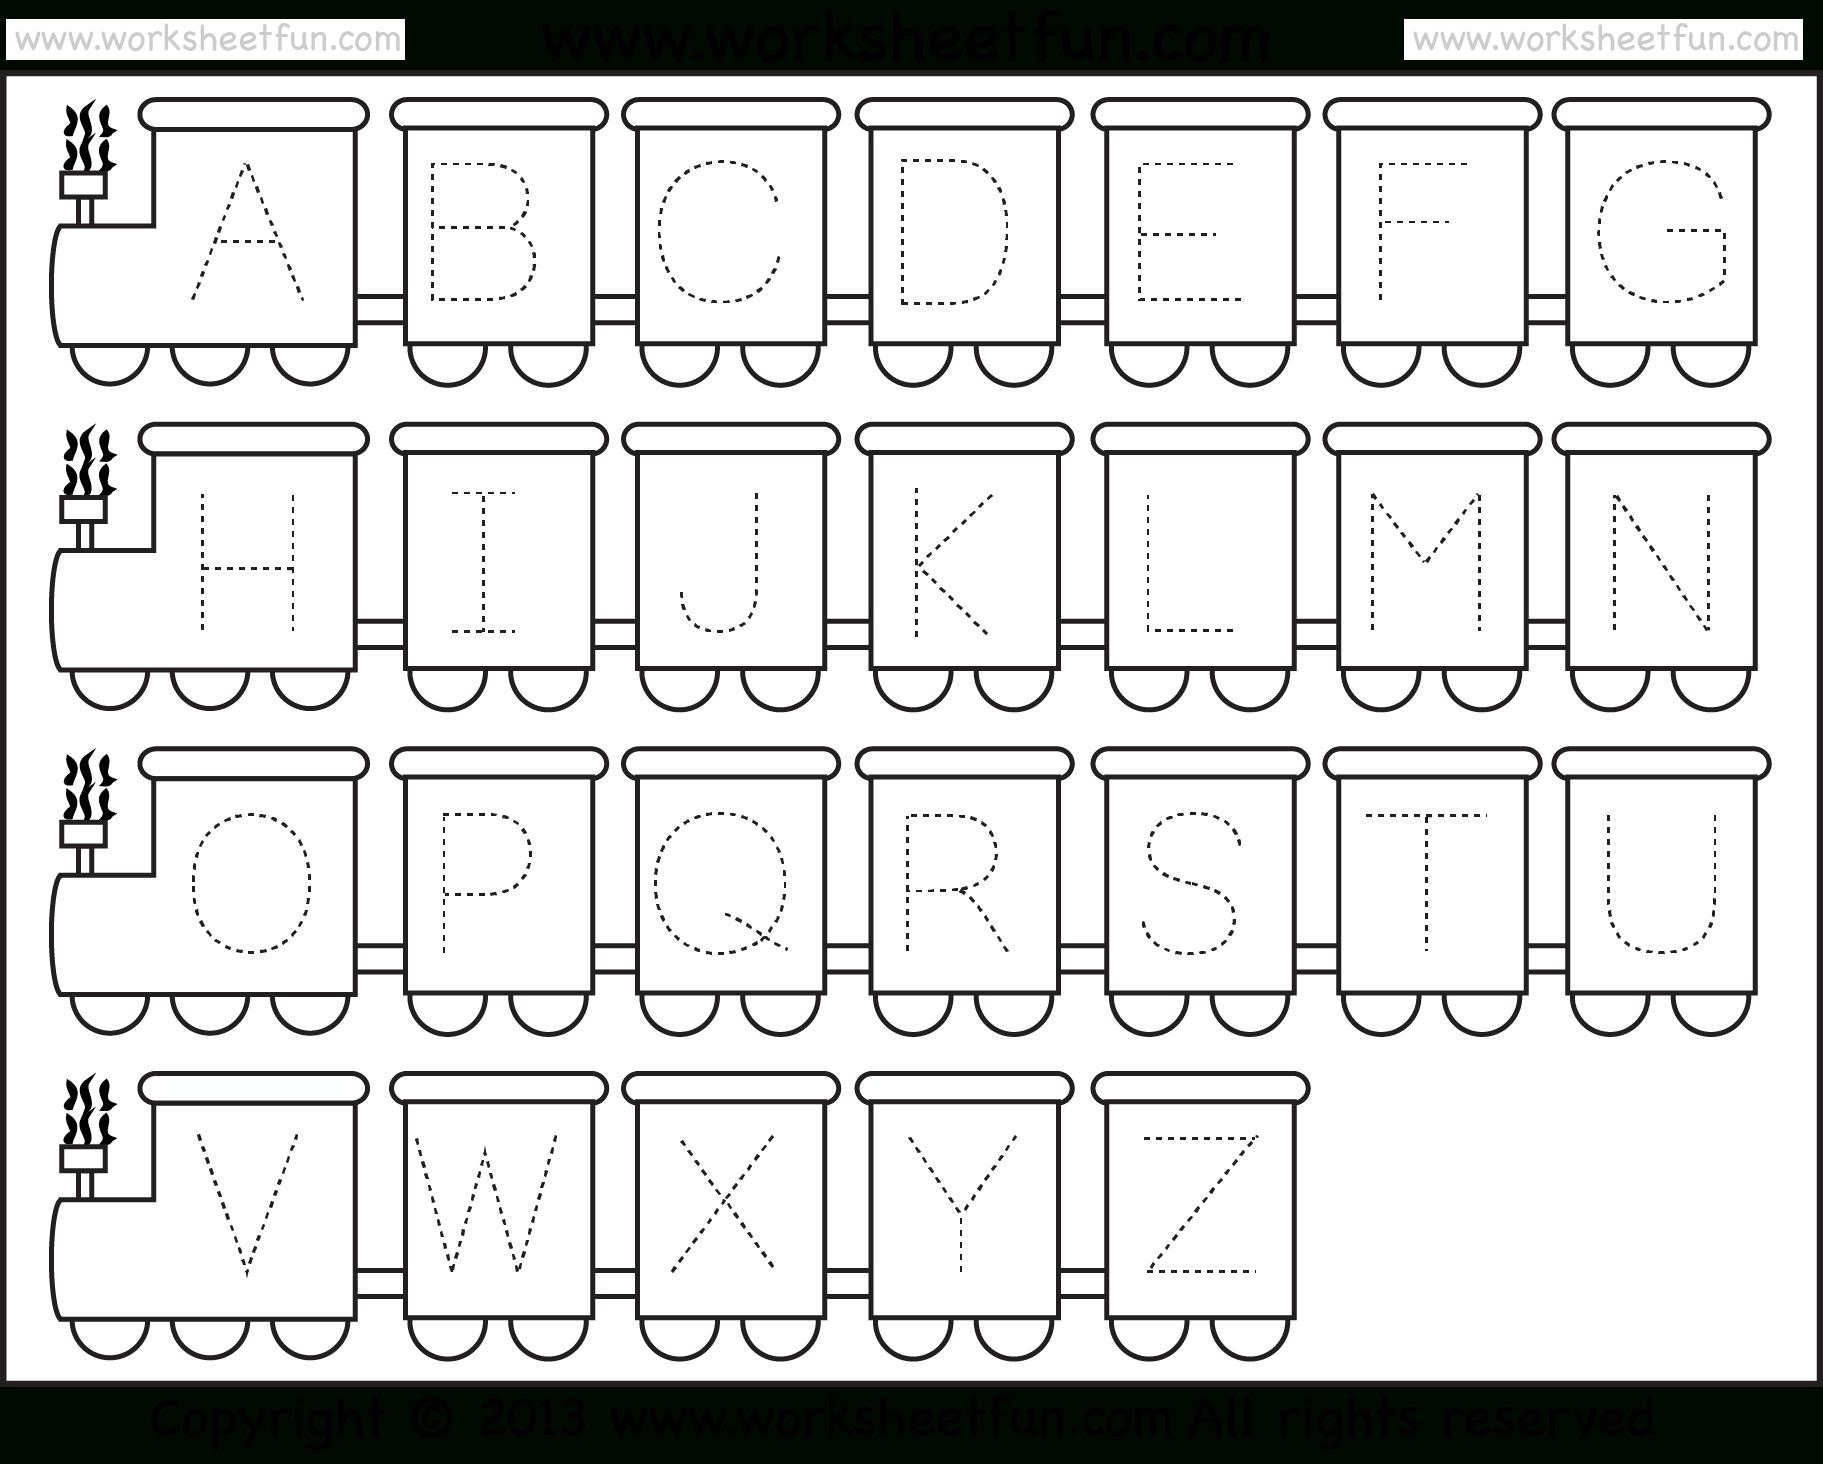 Letter Tracing Worksheet – Train Theme / Free Printable in Alphabet Worksheets Preschool Pdf